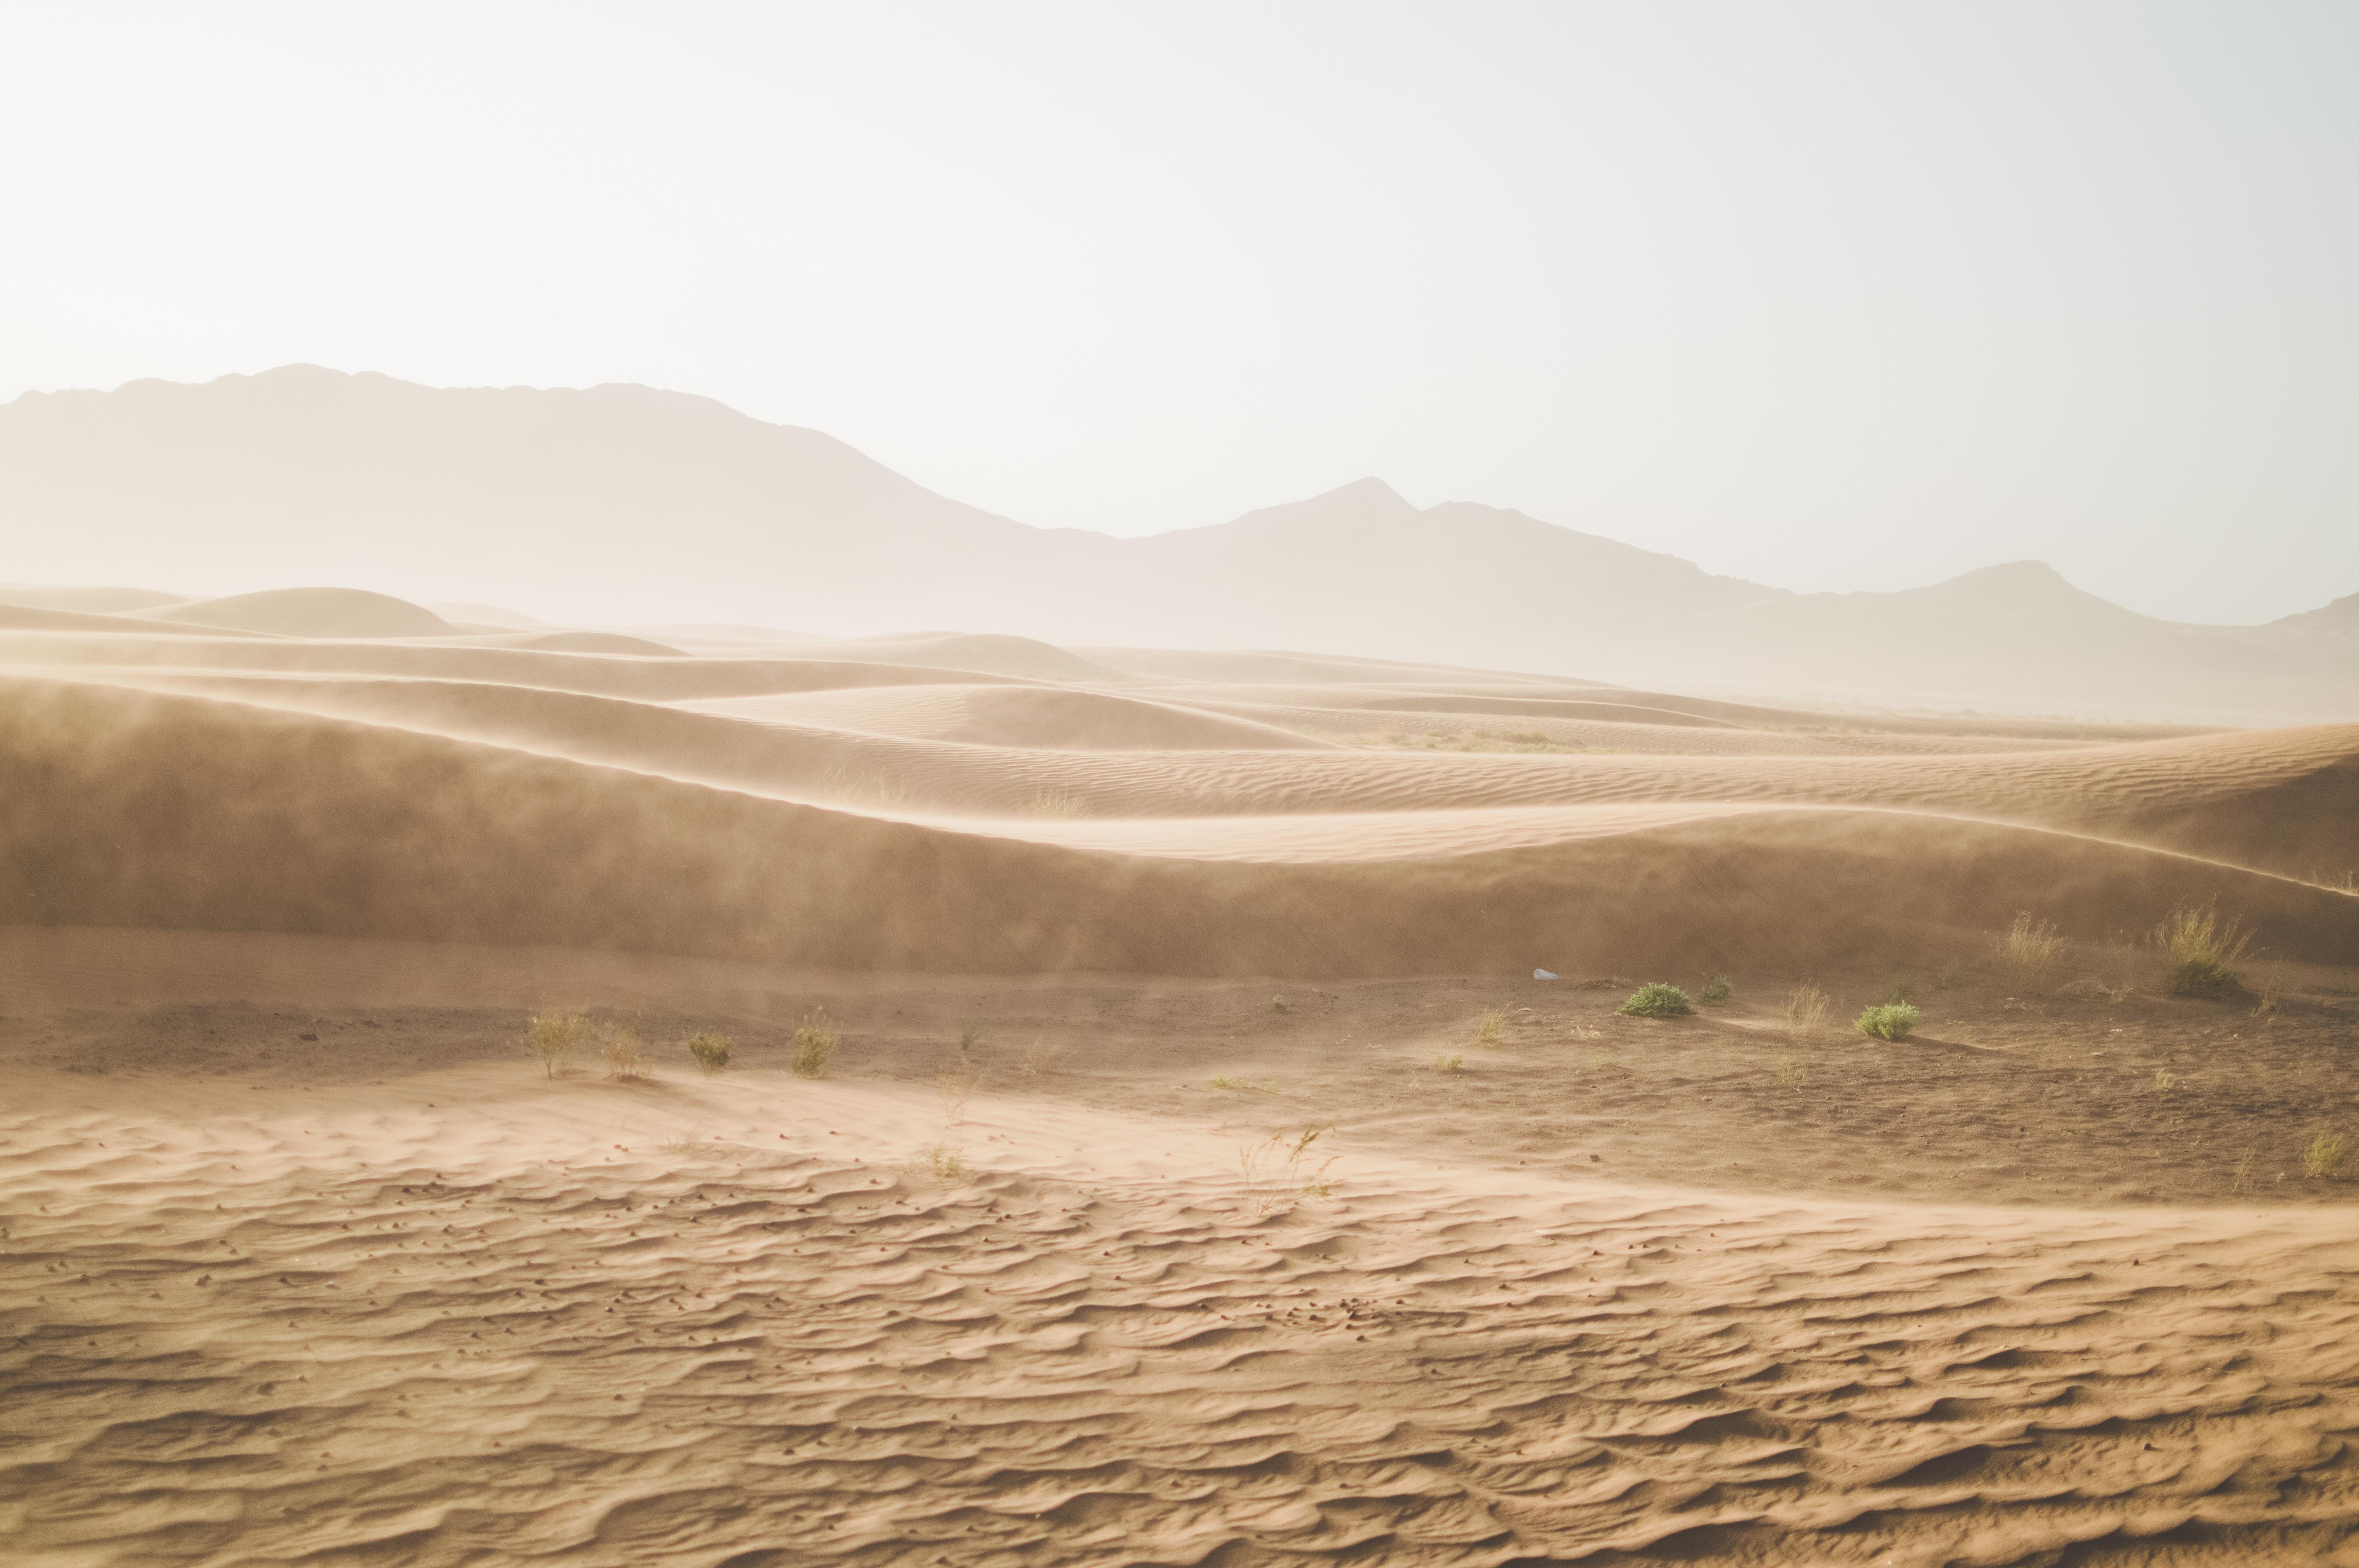 Free Images : landscape, horizon, mountain, hill, desert ...